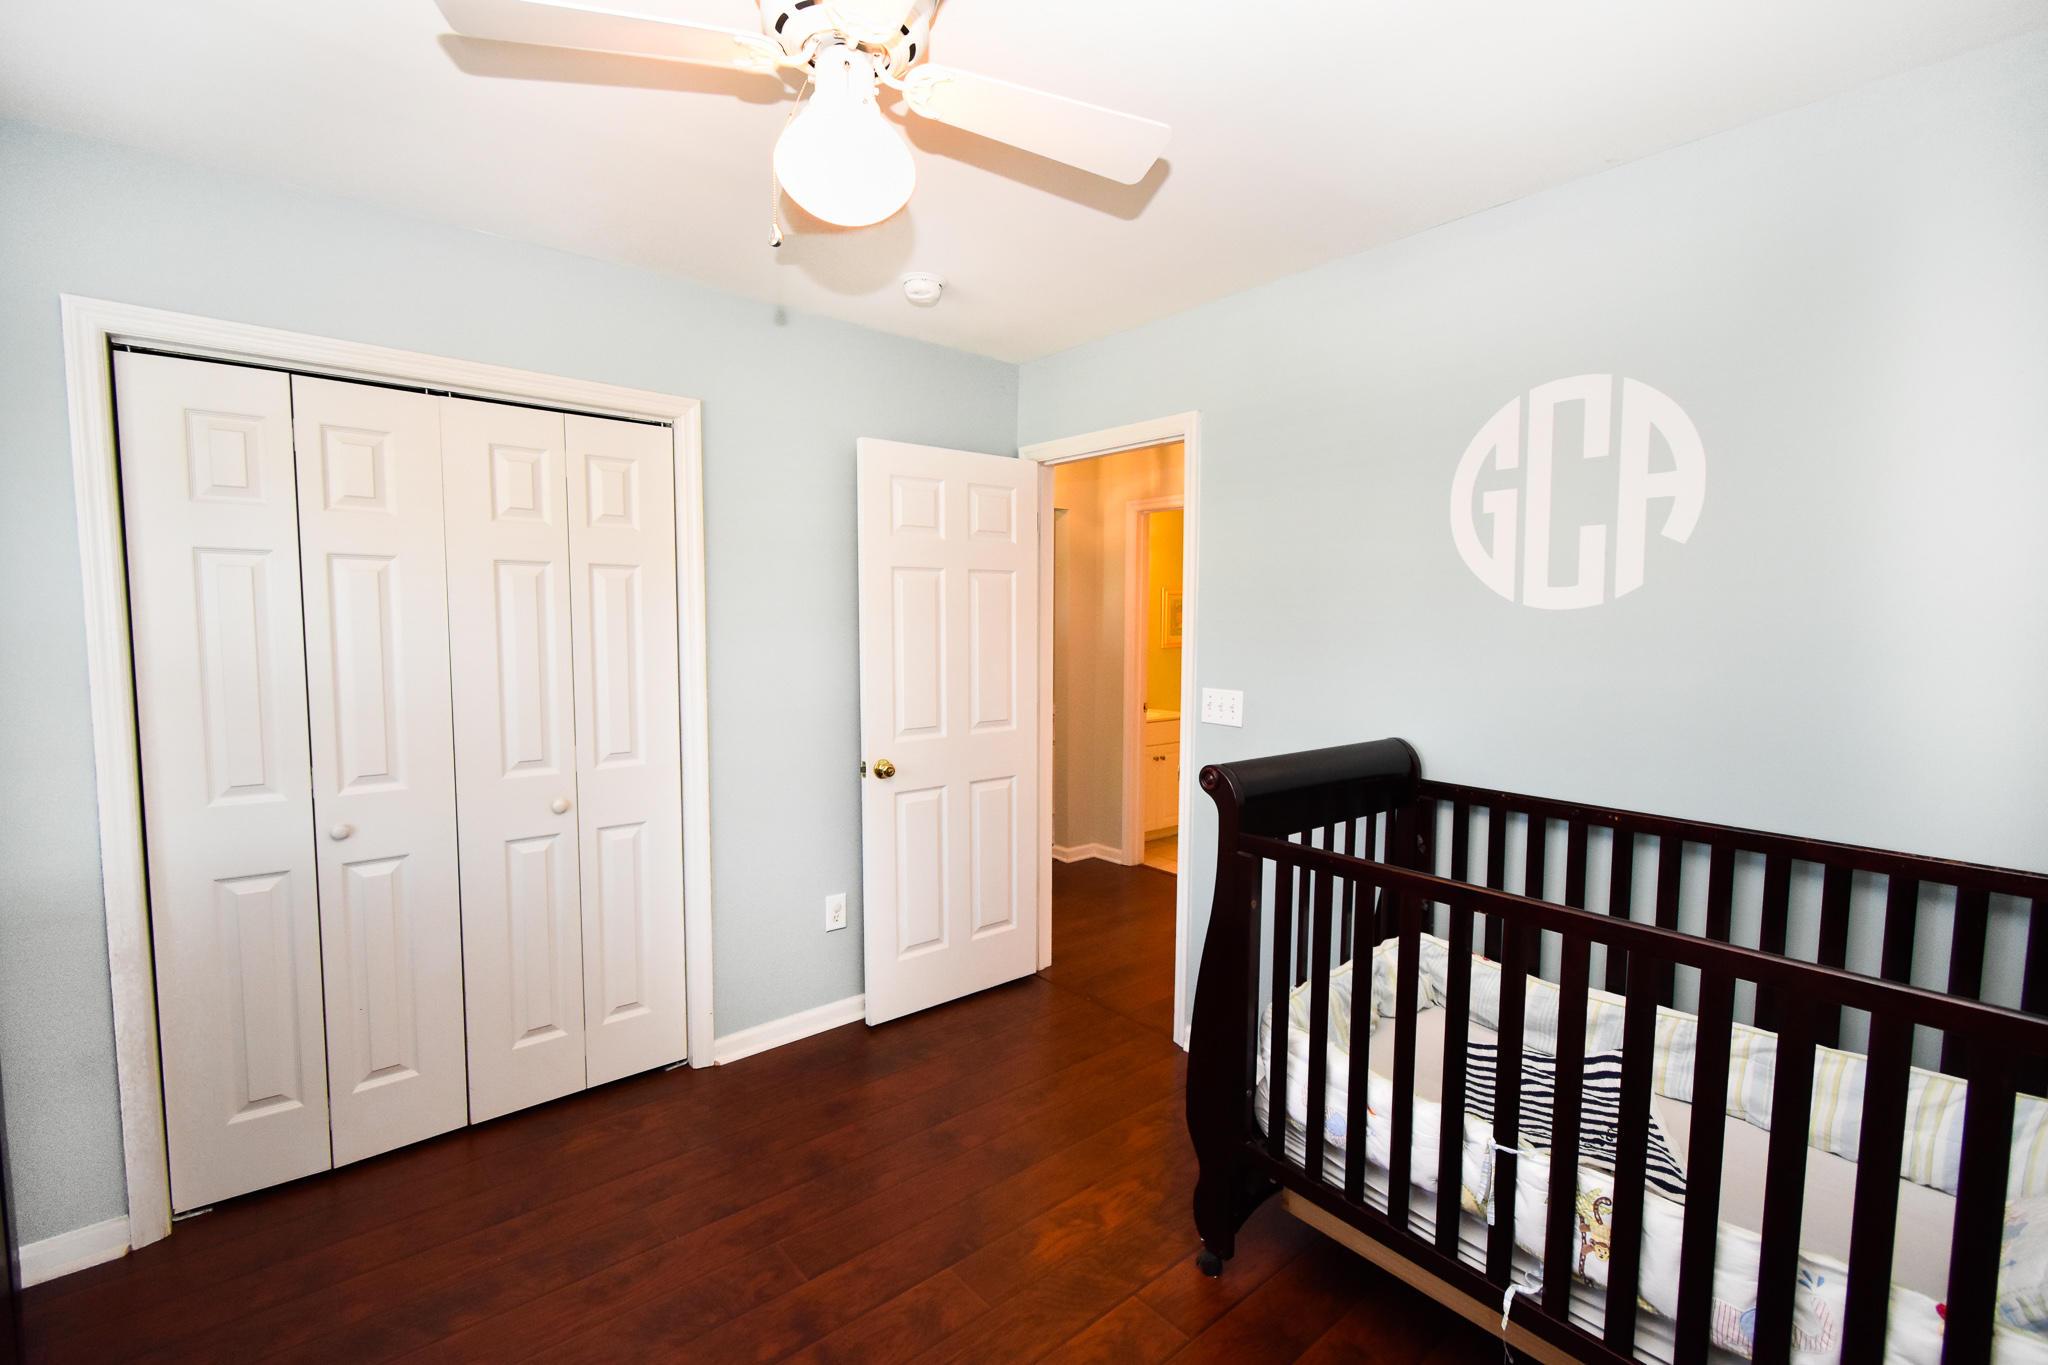 Park West Homes For Sale - 1444 Wellesley, Mount Pleasant, SC - 21